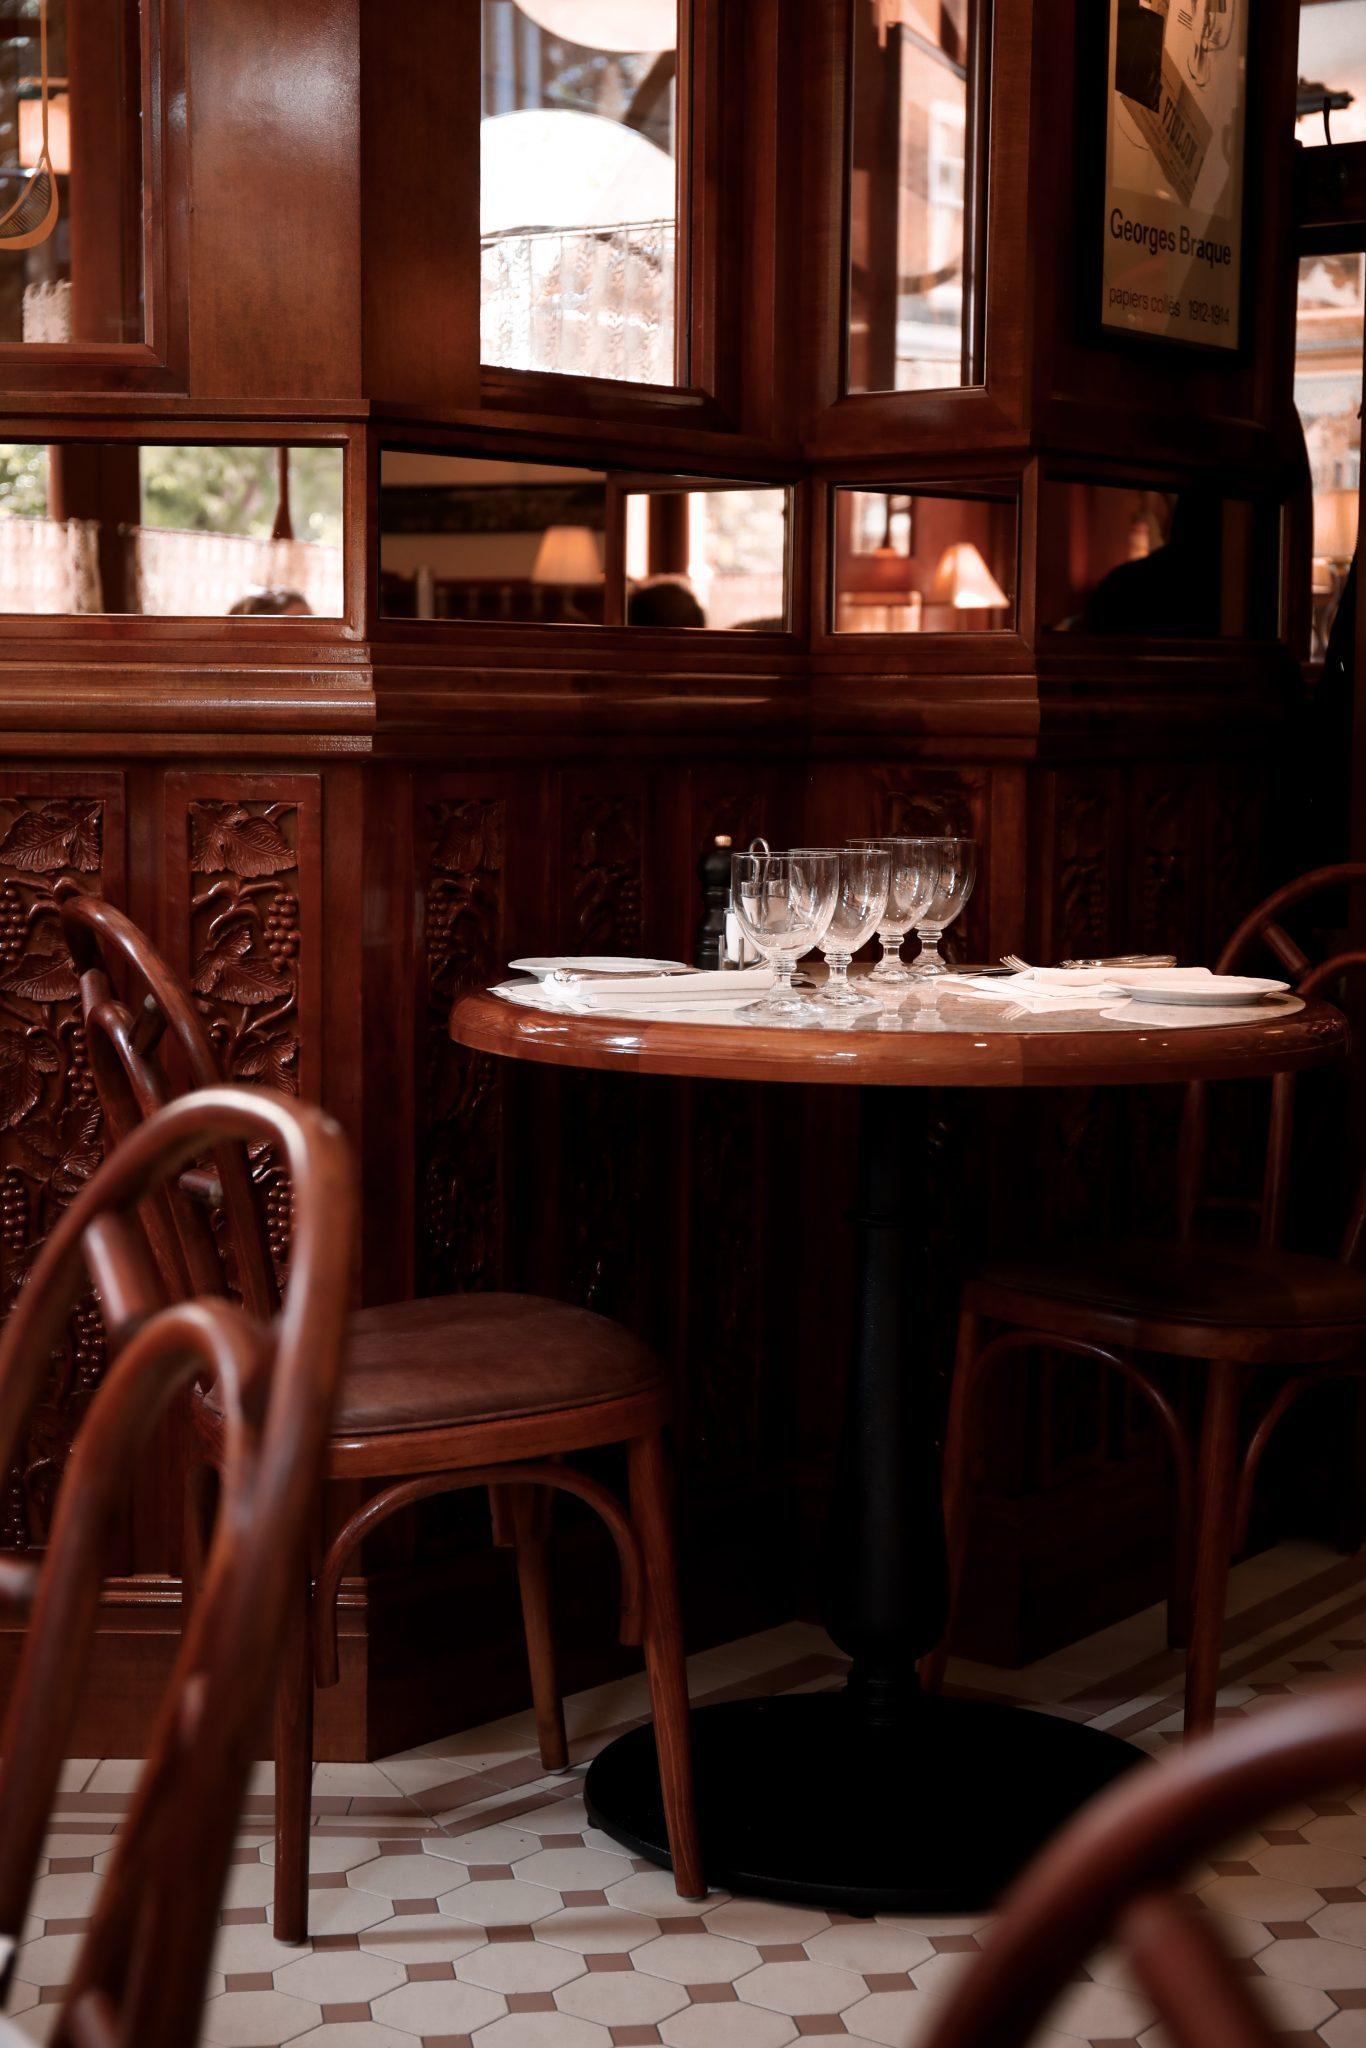 Soutine St John's Wood SJW Parisian Bistro Corbin King